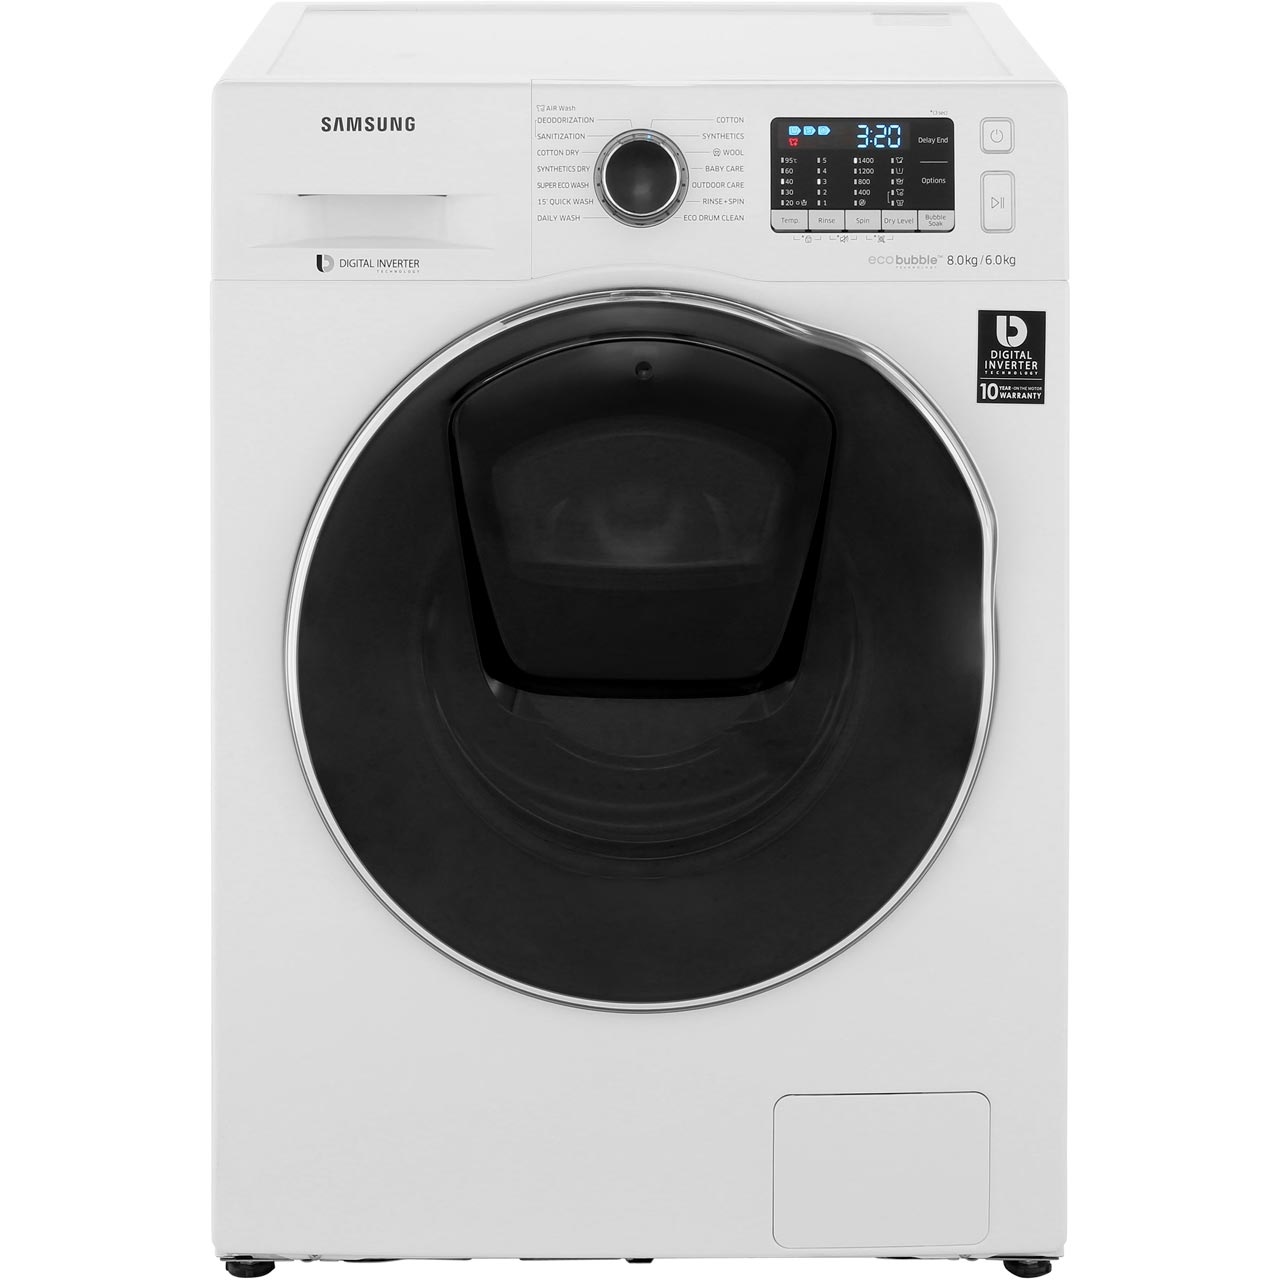 Samsung Addwash Ecobubble Wd80k5b10ow 8kg 6kg Washer